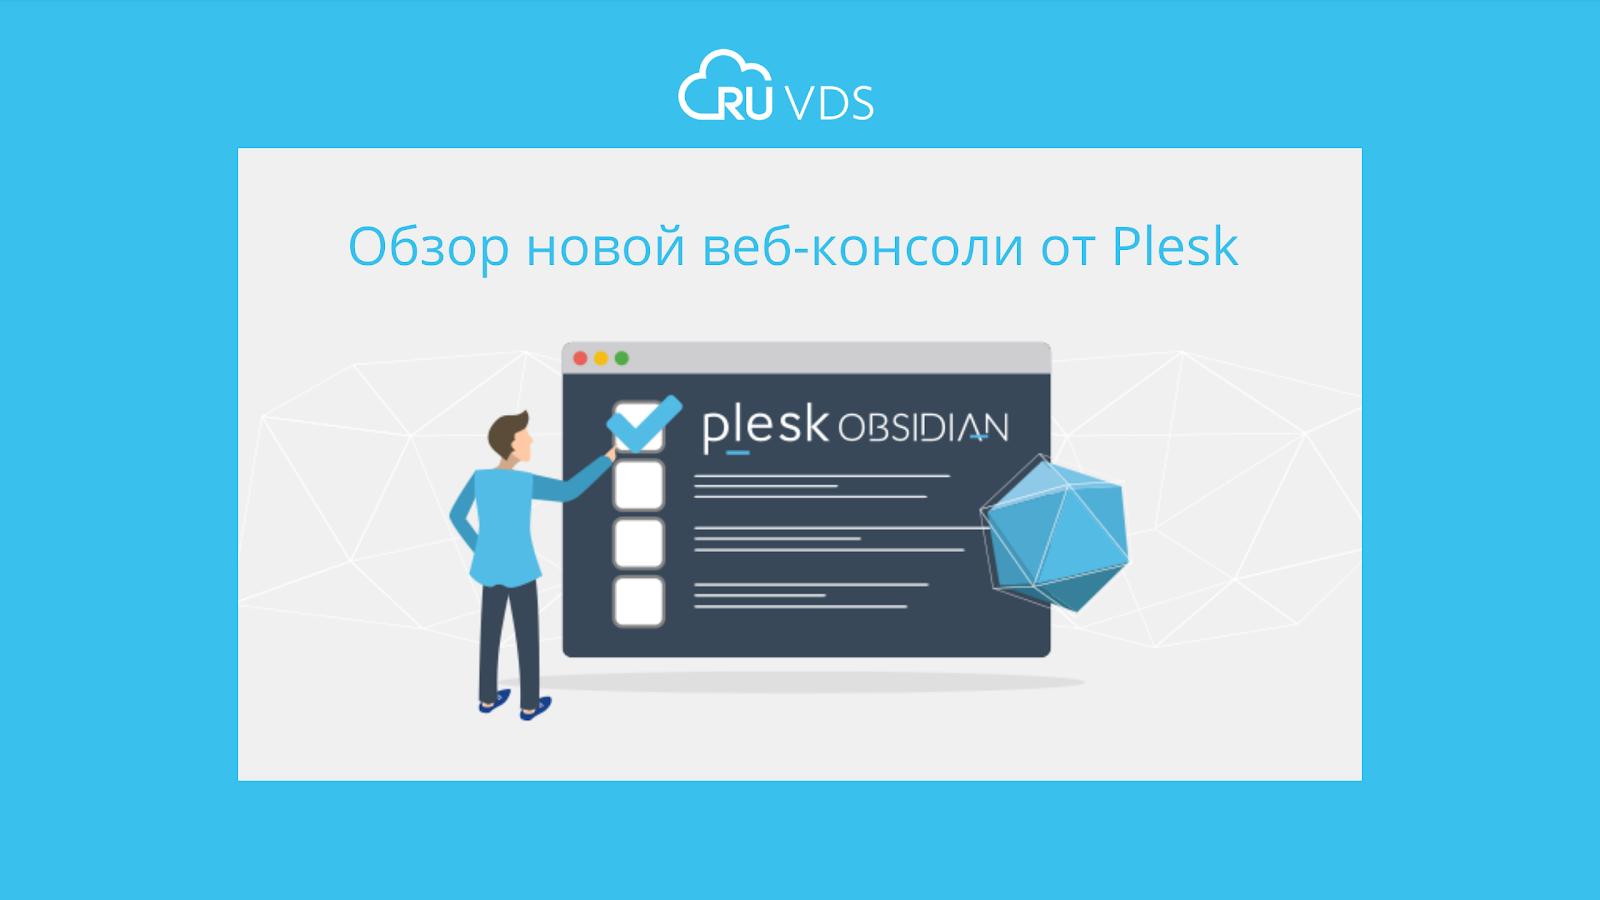 Web-консоль Plesk Obsidian